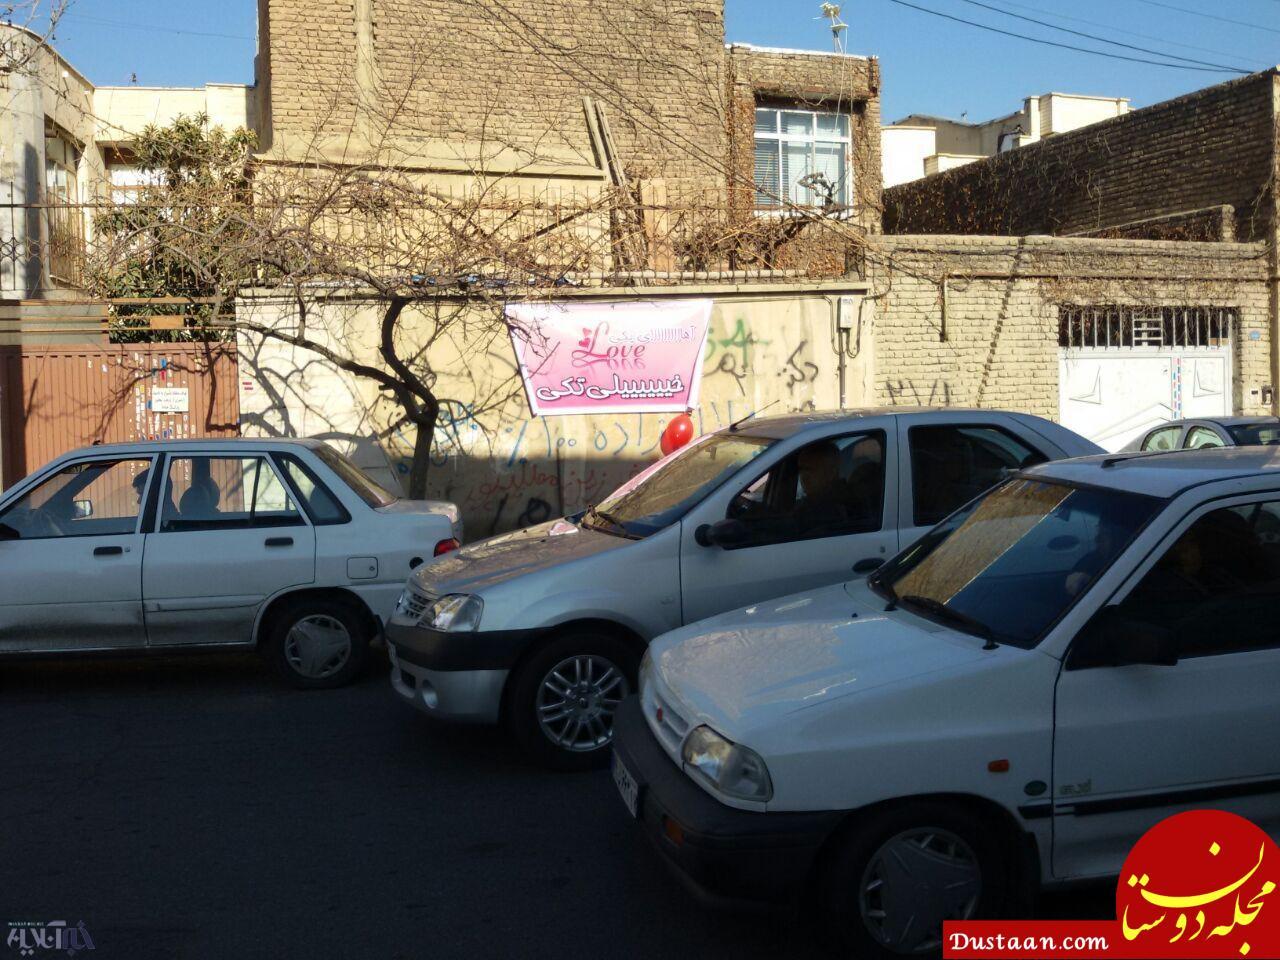 www.dustaan.com اعلان عشق مقابل مدرسه ابتدایی با بنر! +عکس